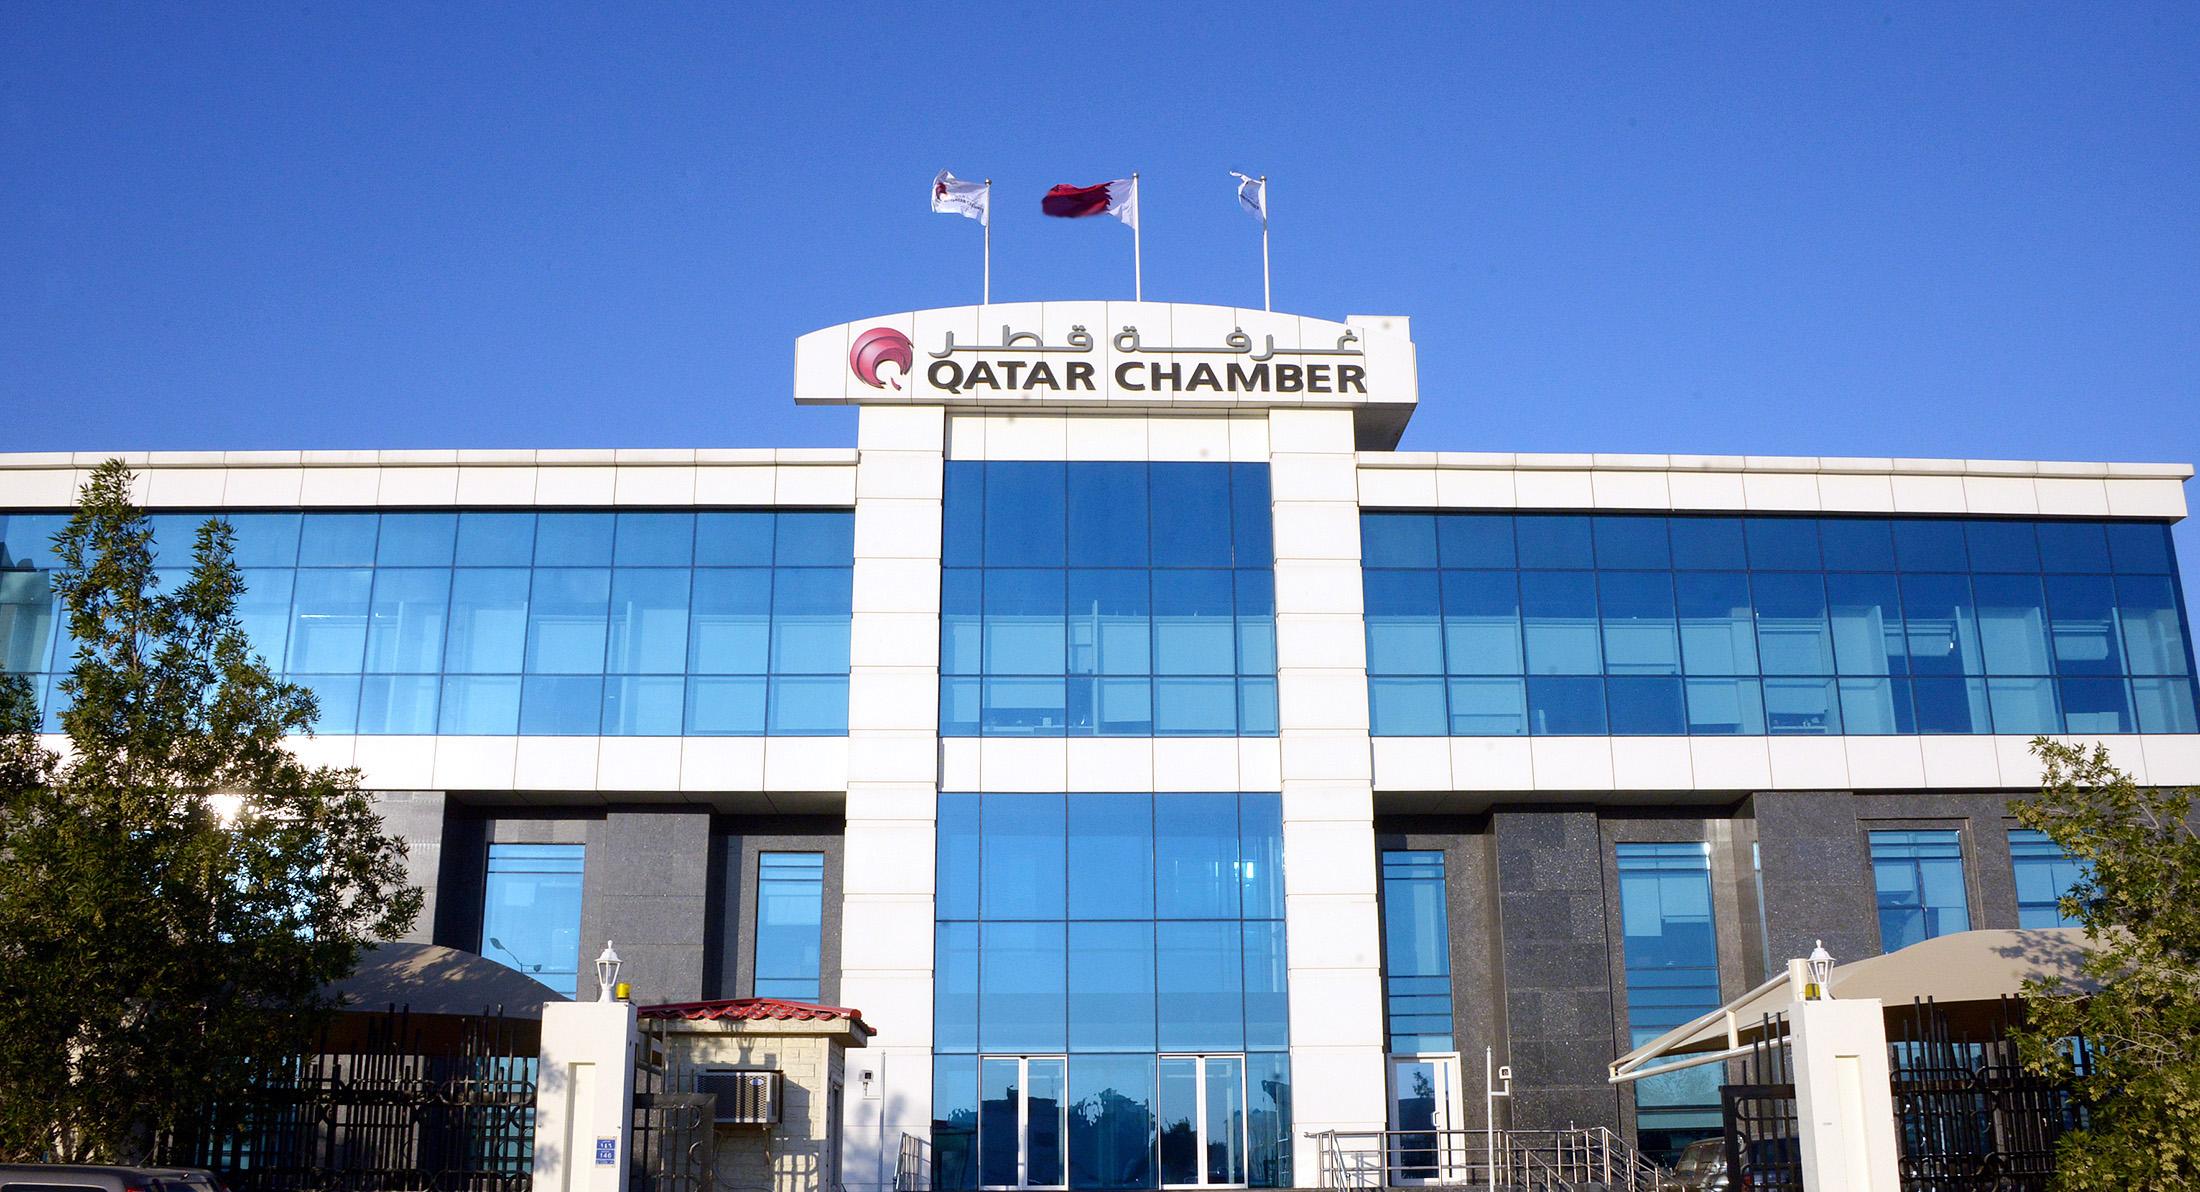 PPP law to accelerate Qatar's economic development: QC